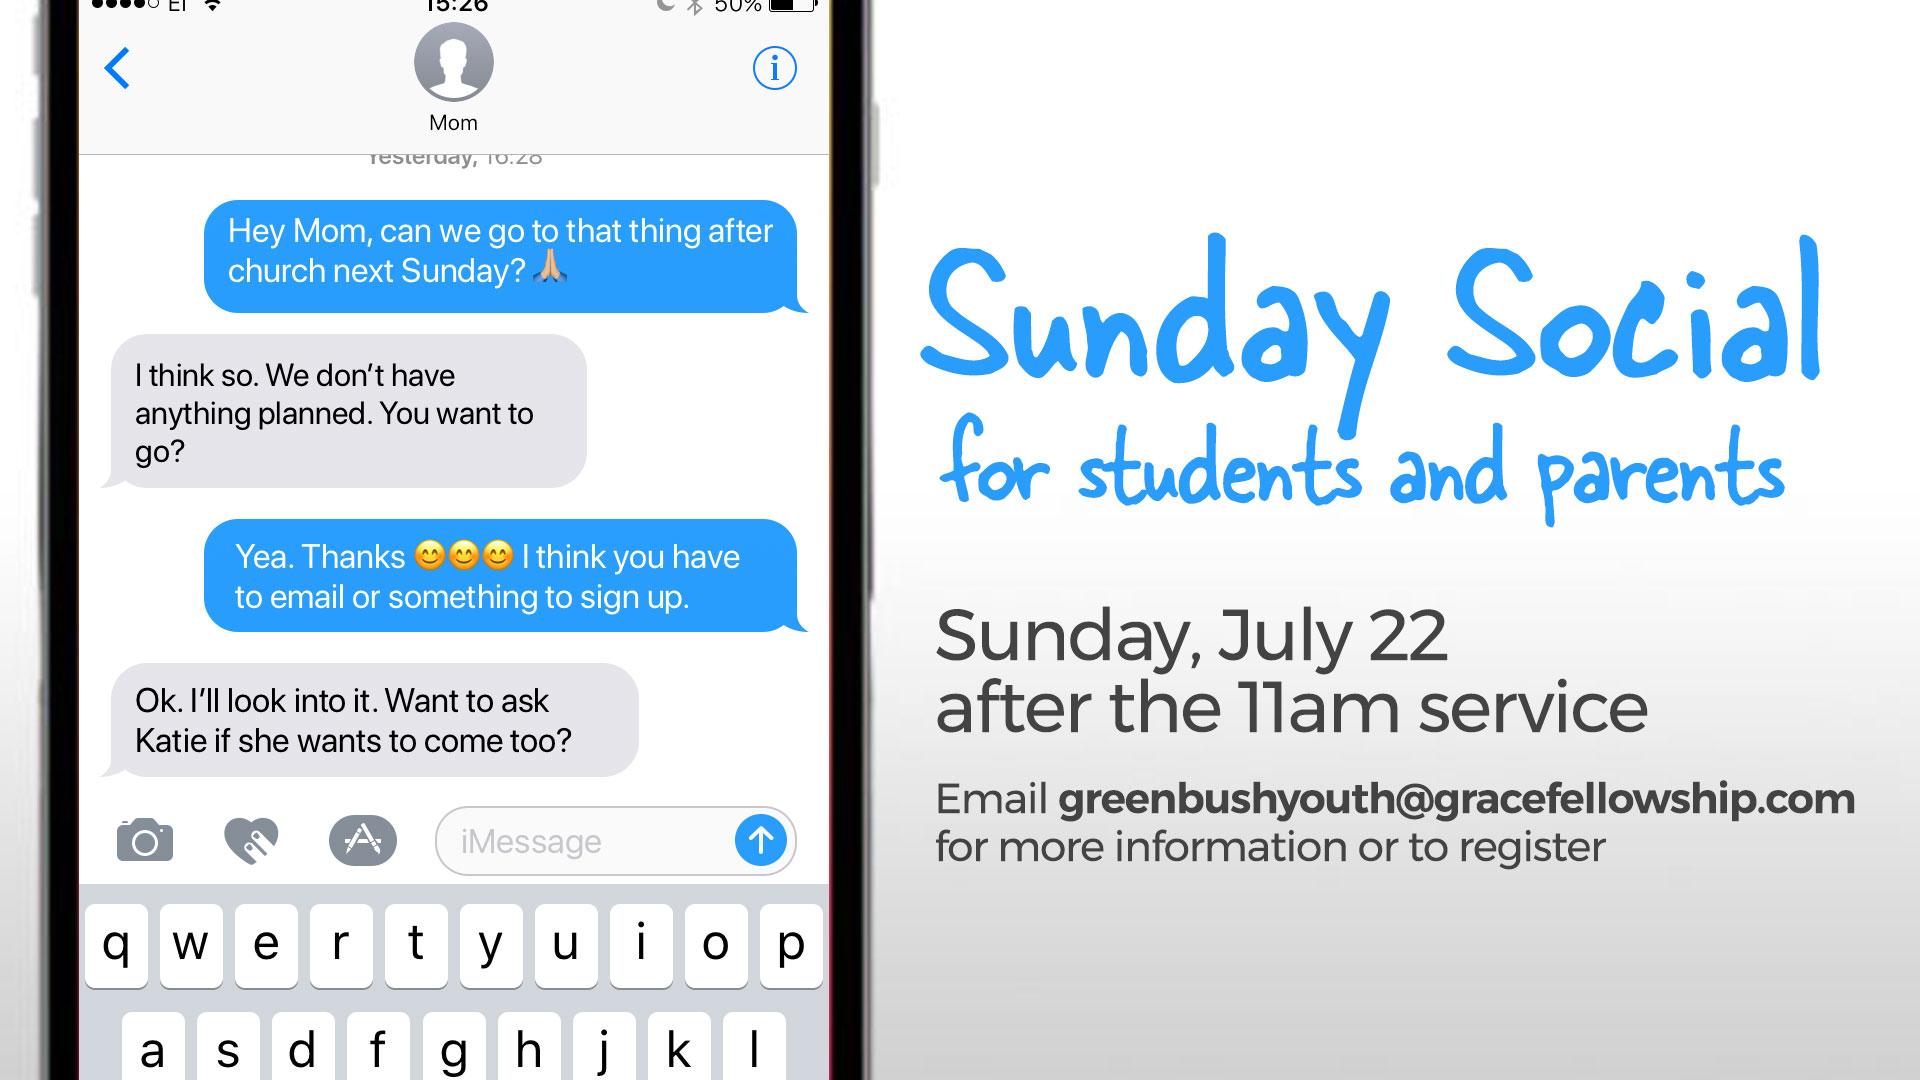 Student & Parent Sunday Social – Sunday, July 22nd @ 12:30pm